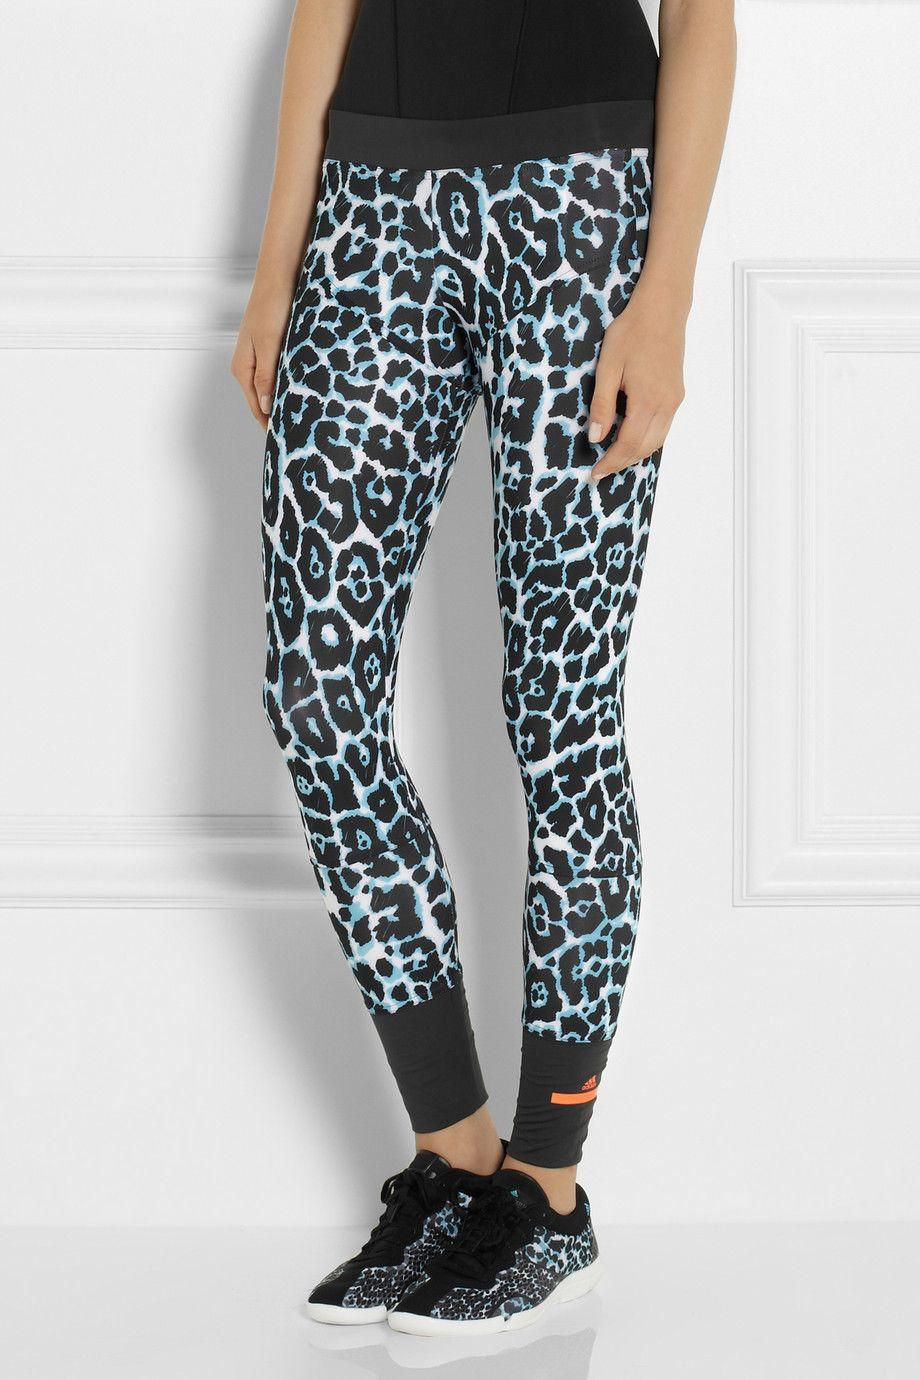 92f10df7ba3 Adidas by Stella McCartney | Leopard-print stretch-jersey leggings |  NET-A-PORTER.COM